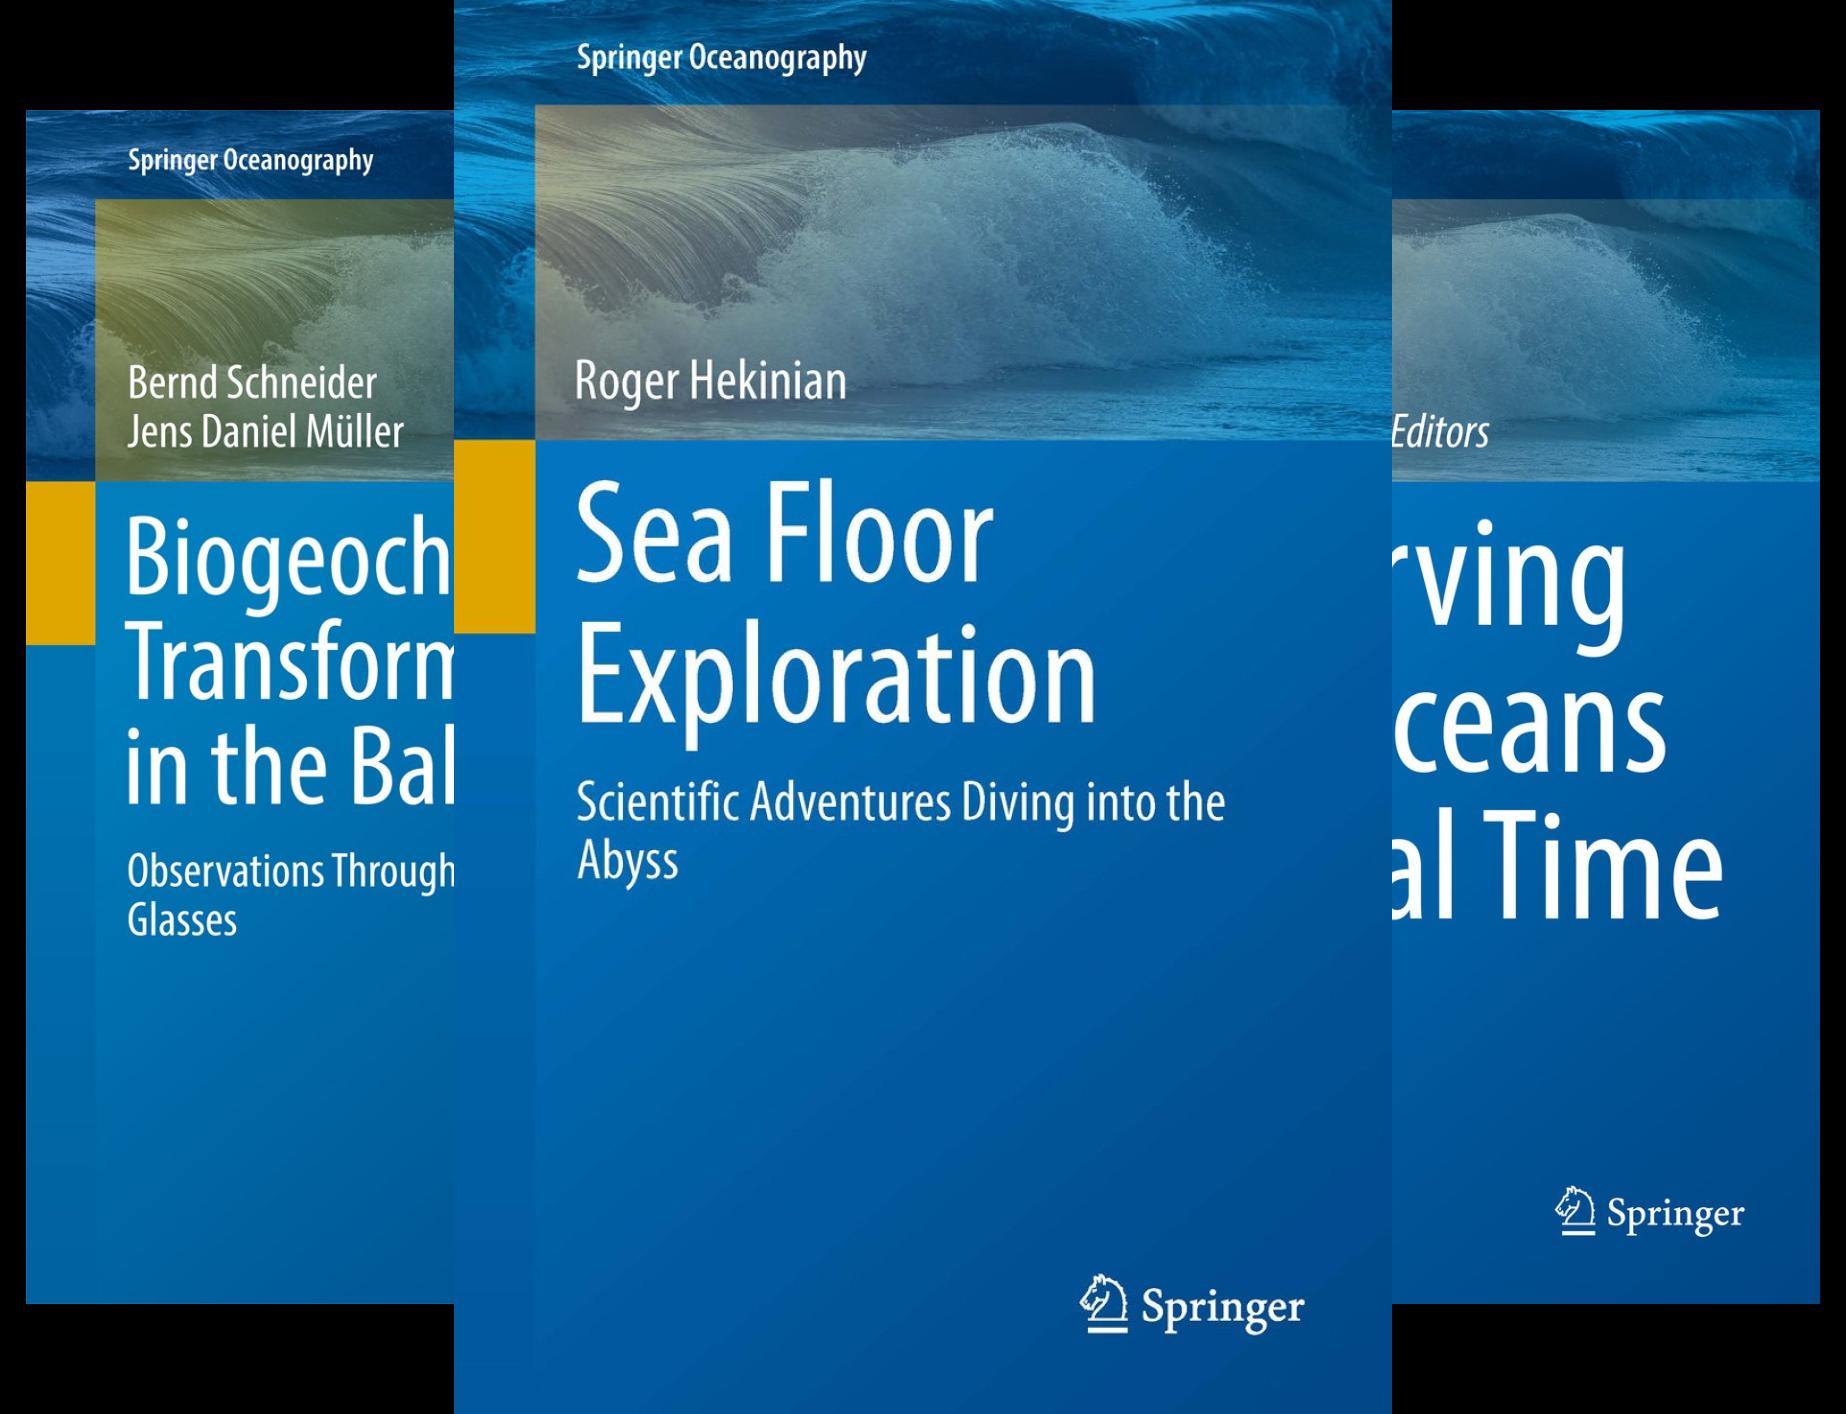 Springer Oceanography